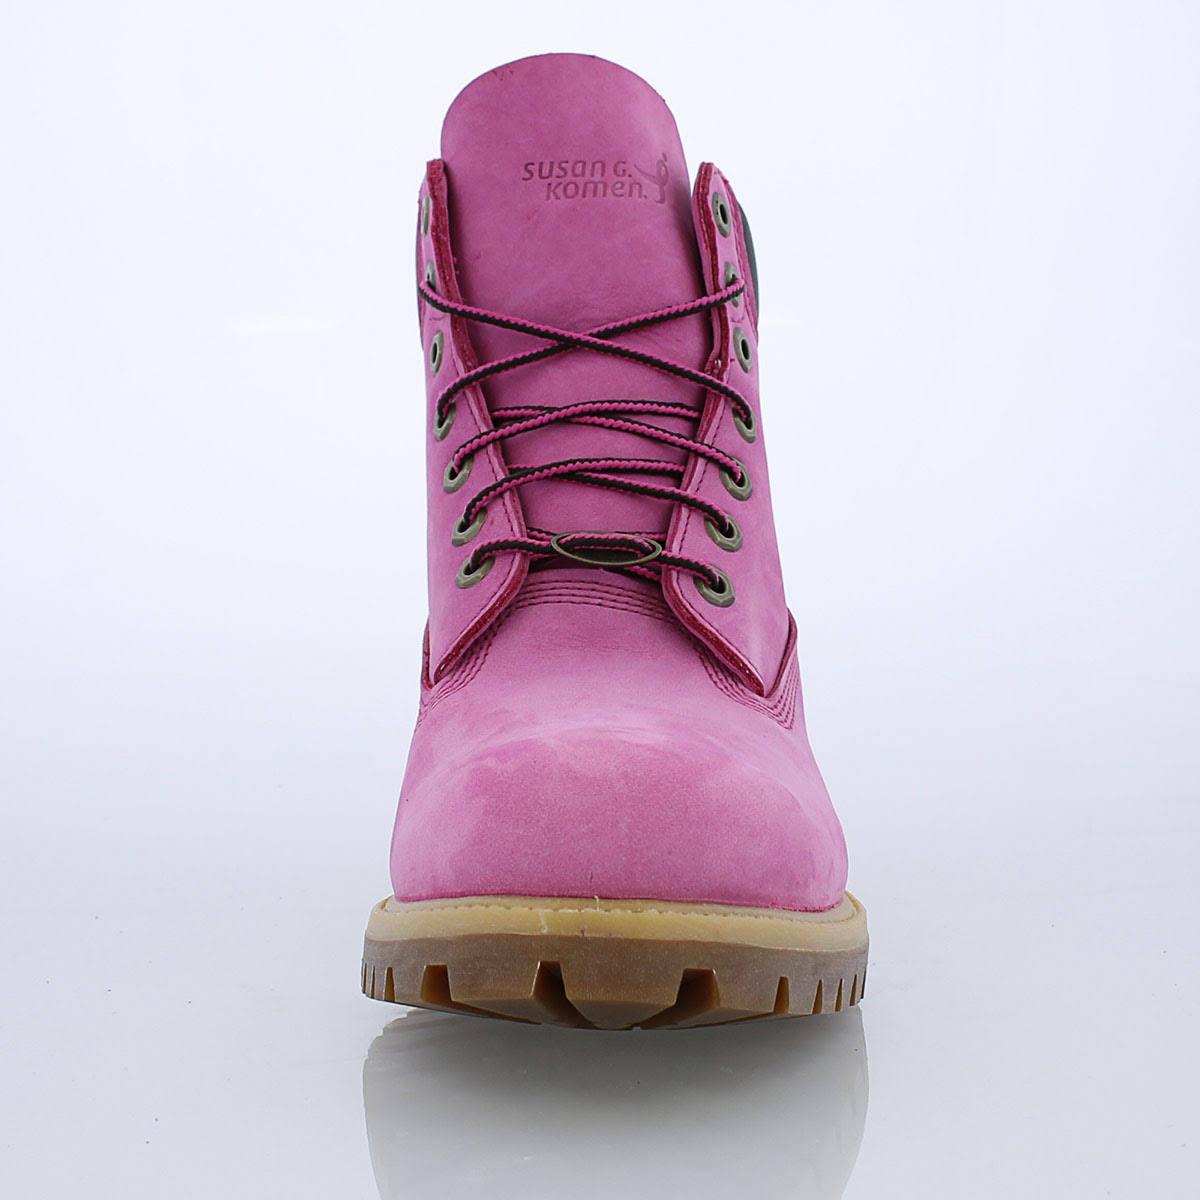 Rose Inch Hombres Boot Premium 6 Timberland Sgk Nubuck Ibis wBq0A0